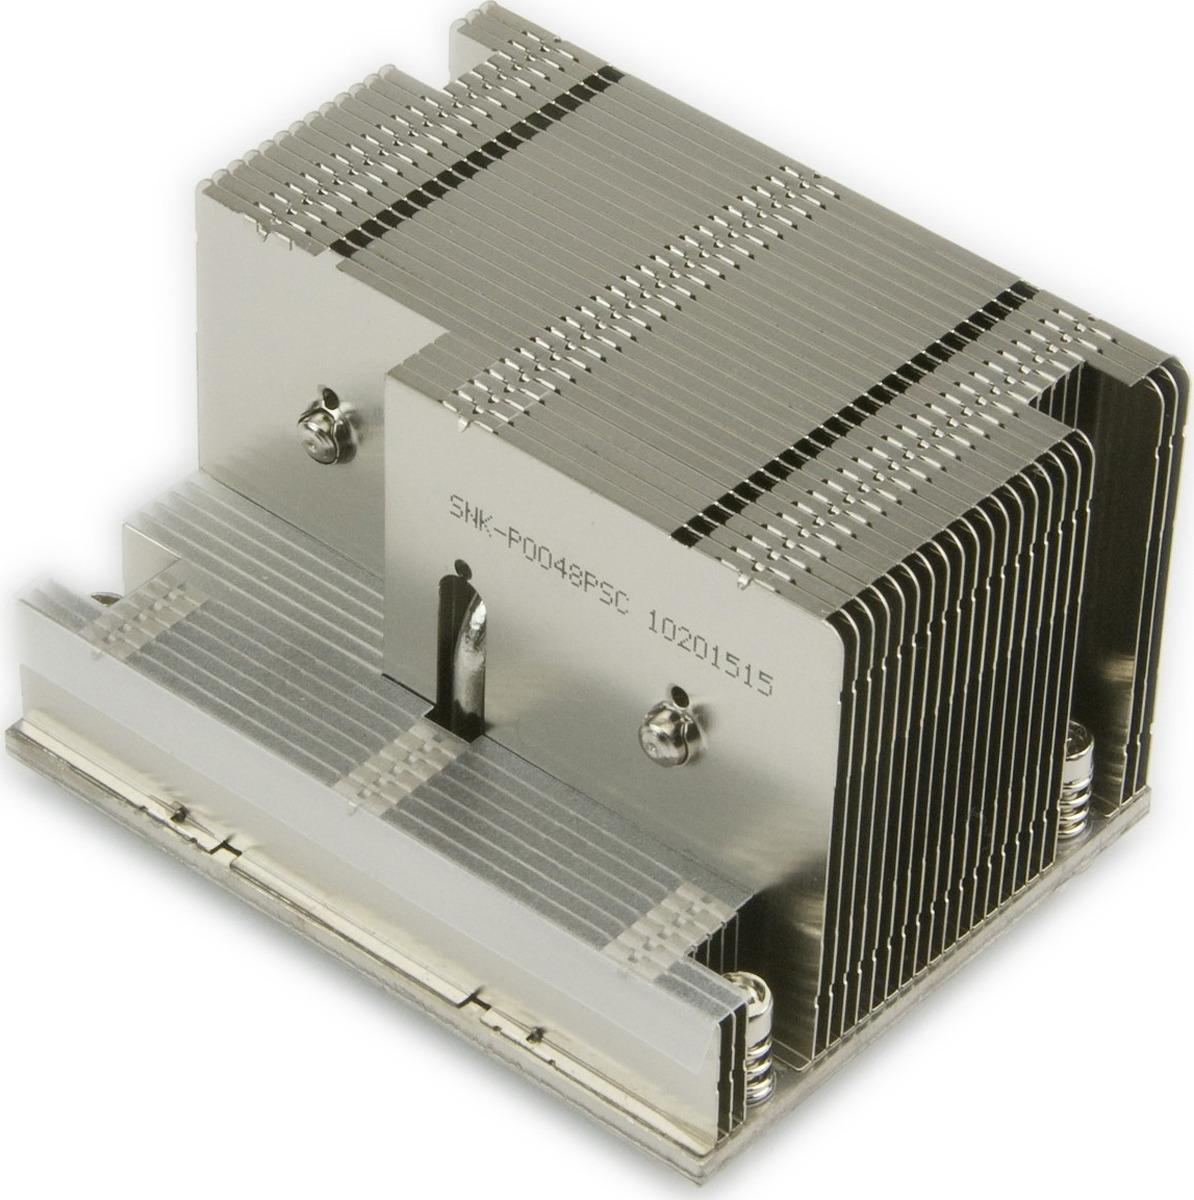 Радиатор SuperMicro SNK-P0048PSC new jamma cbox mvs snk neogeo mvs 1b to db 15p snk joypad ss gamepad with av rgb output for neogeo 161 in 1